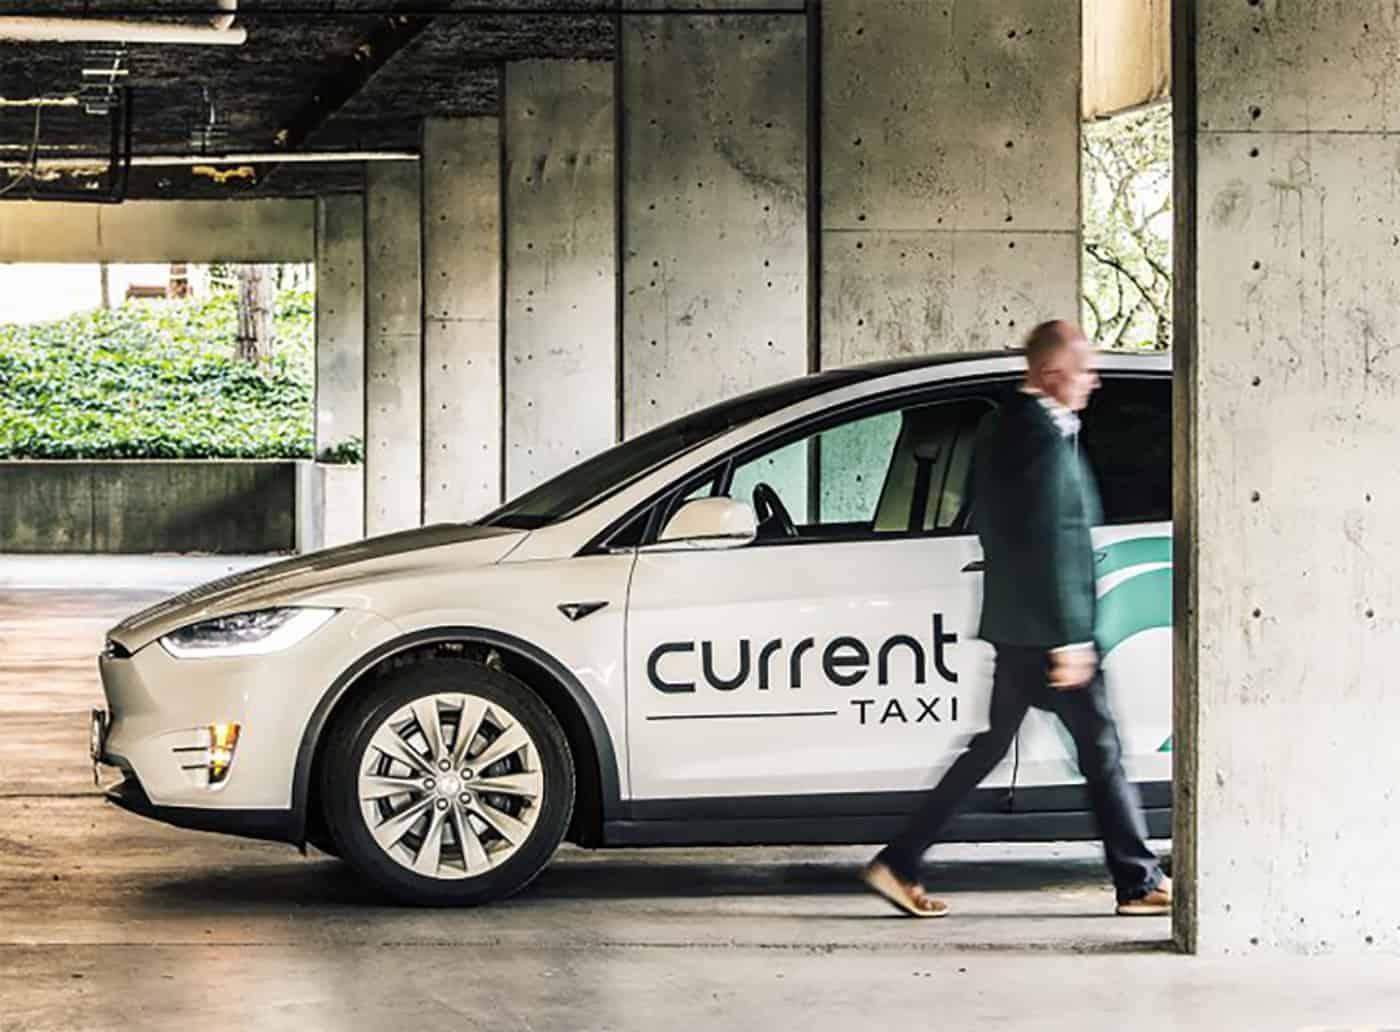 Current taxi brand ambassador walks past a parked Tesla Taxi